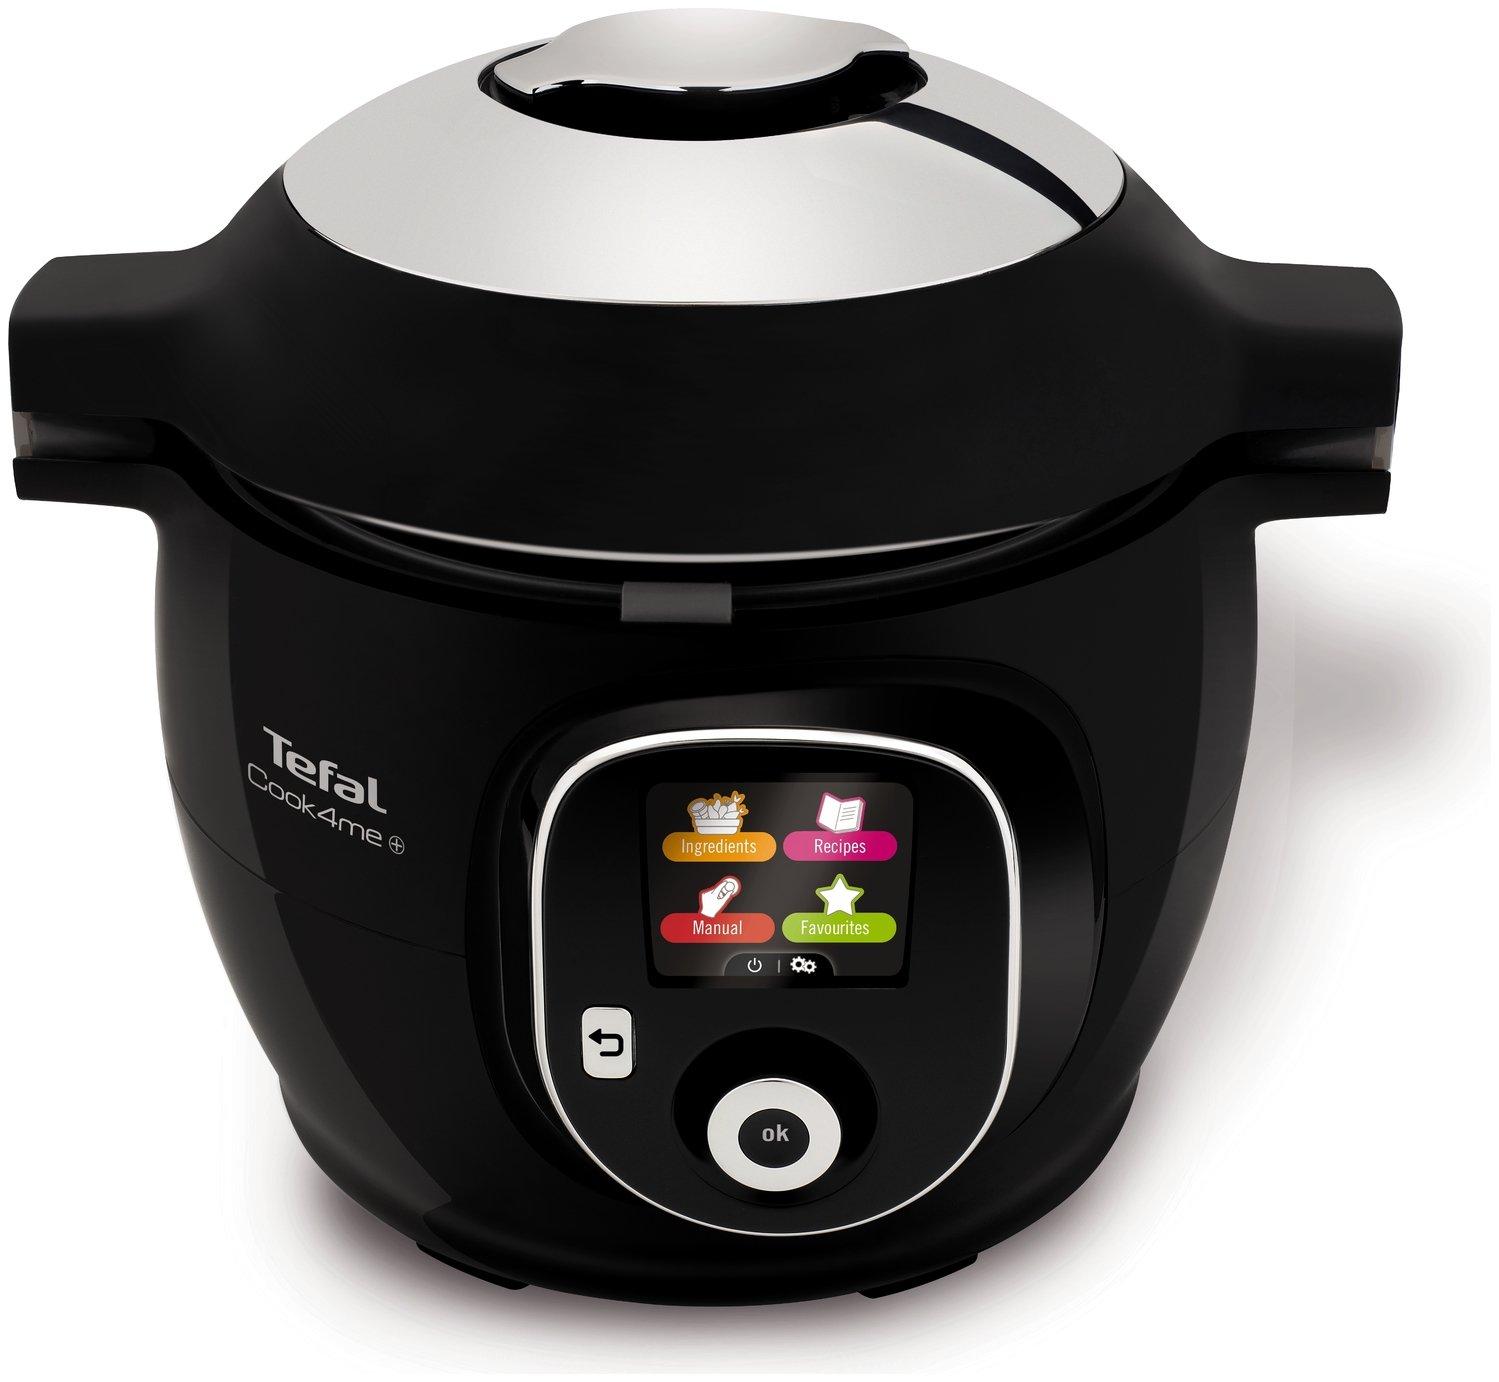 Tefal Cook 4 Me Plus 5-in-1 6.5L Pressure Cooker review